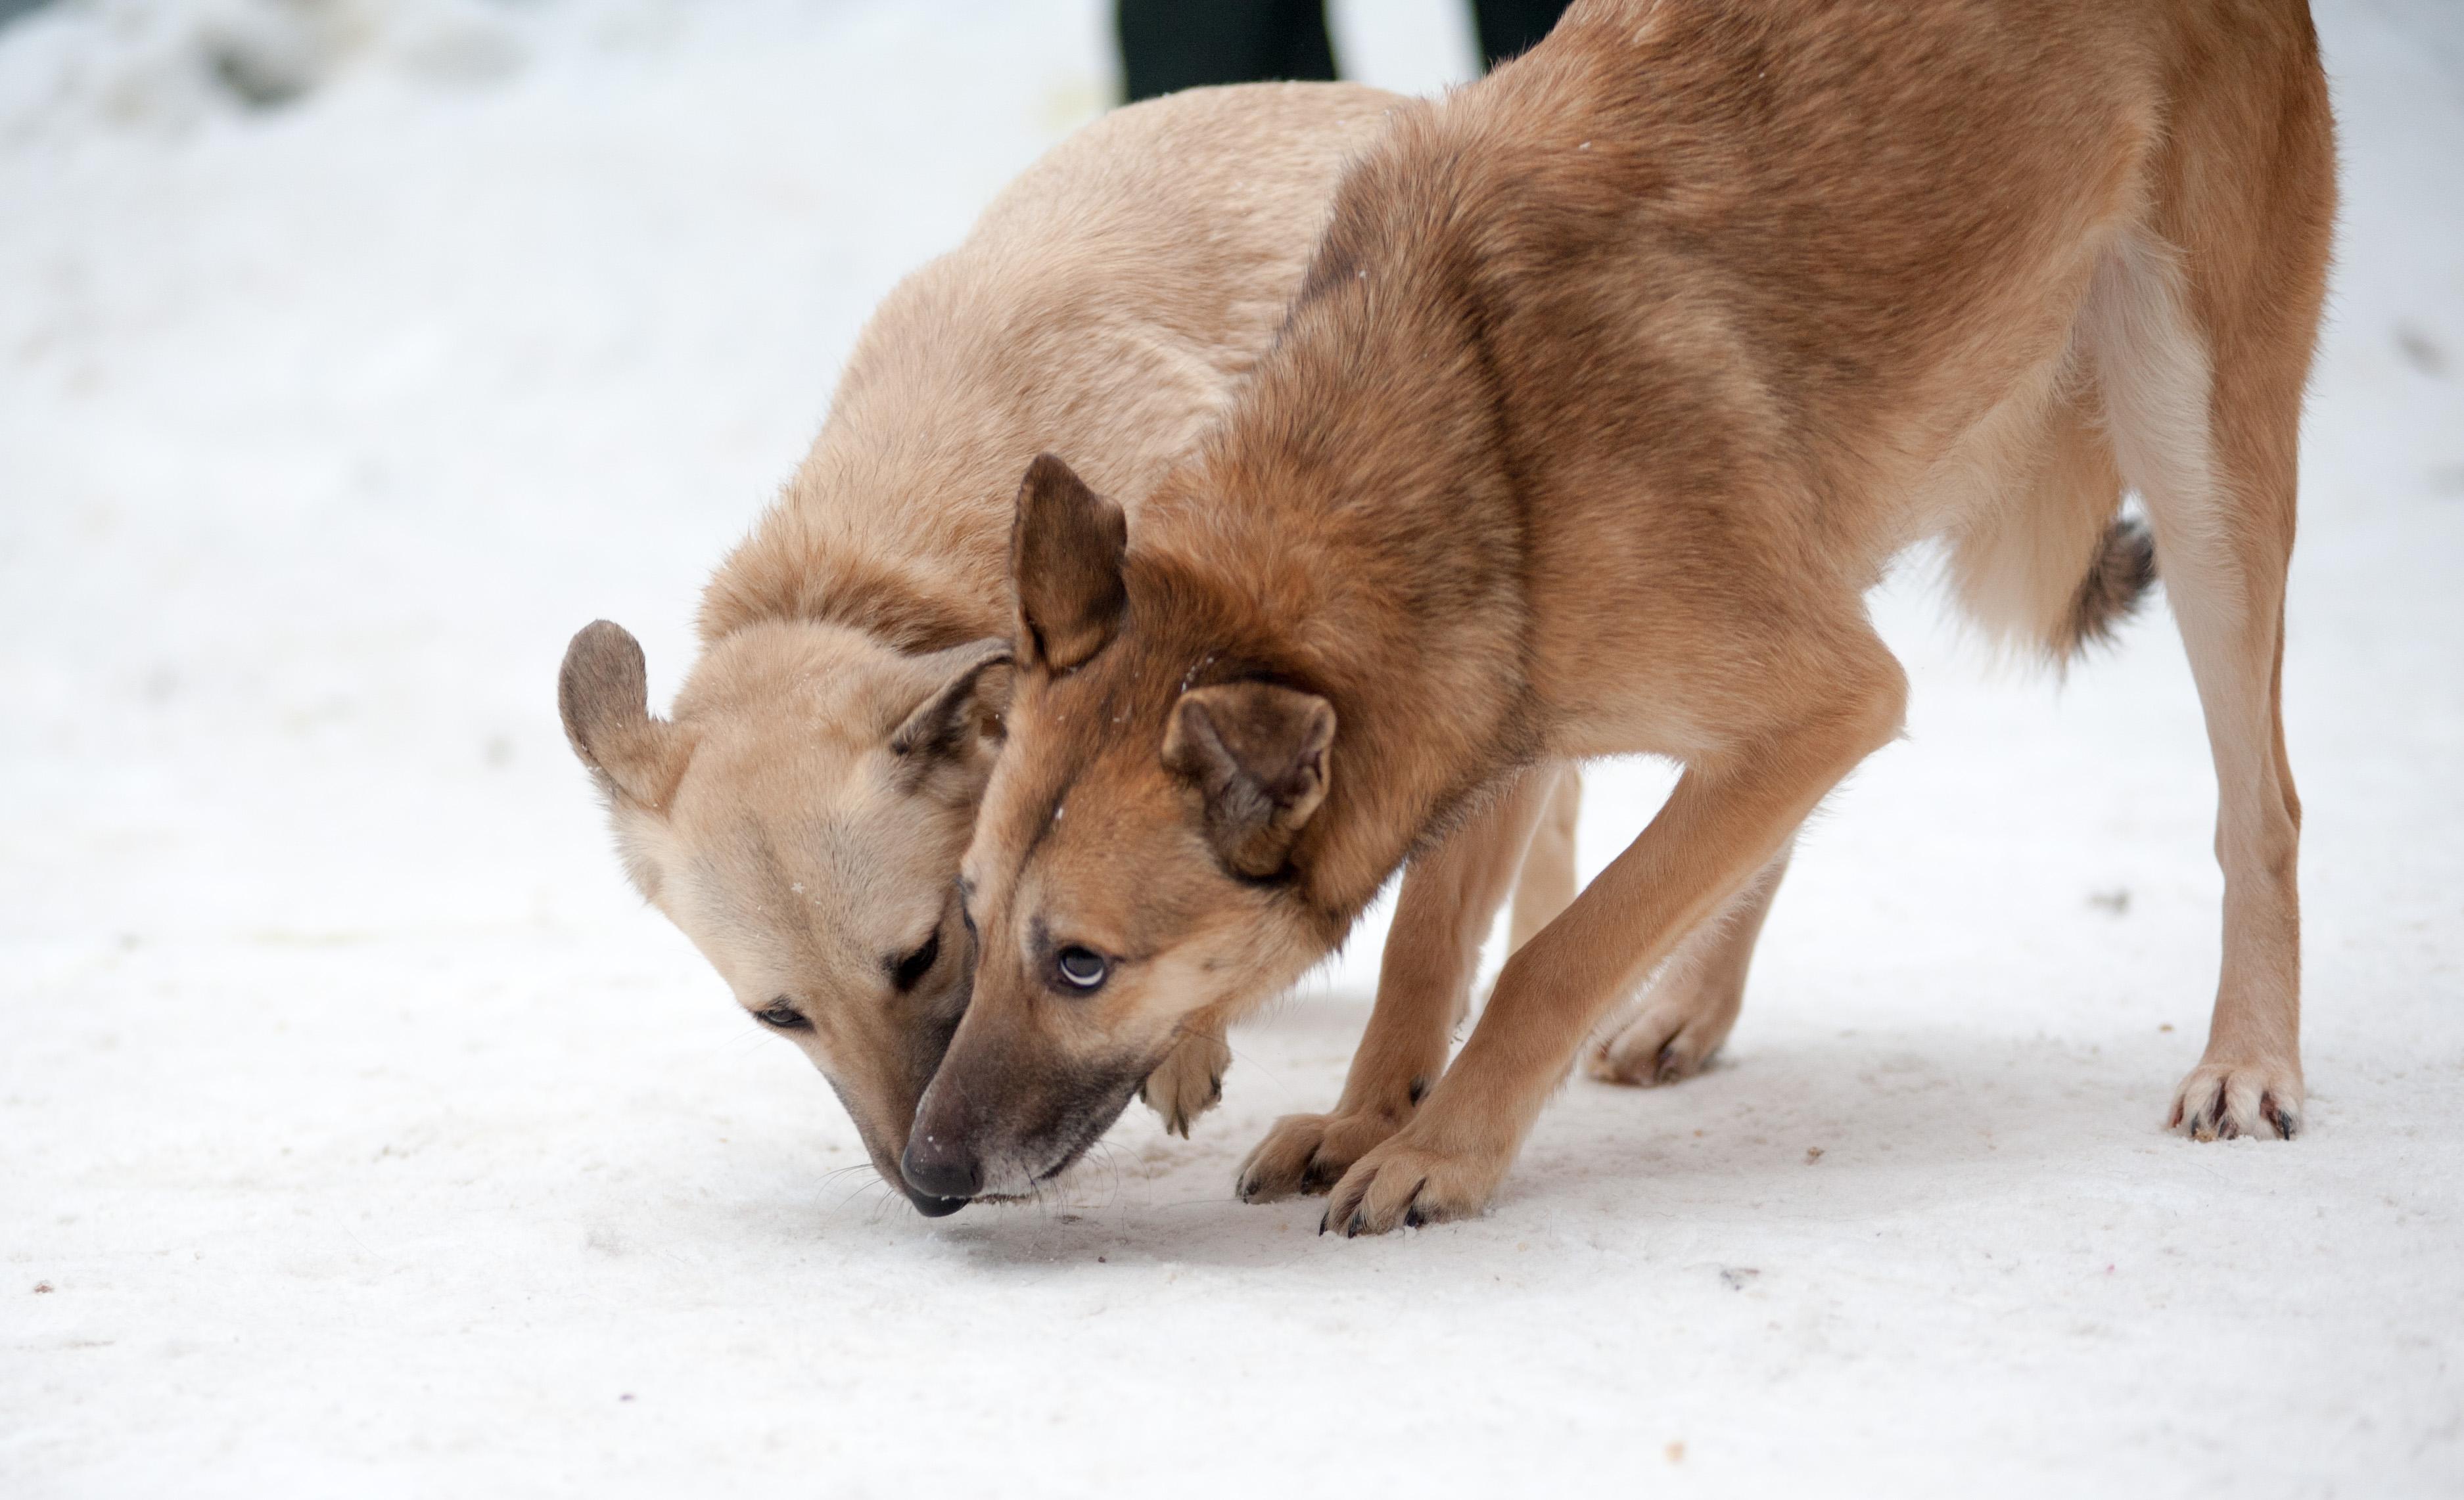 Анка собака из догпорта